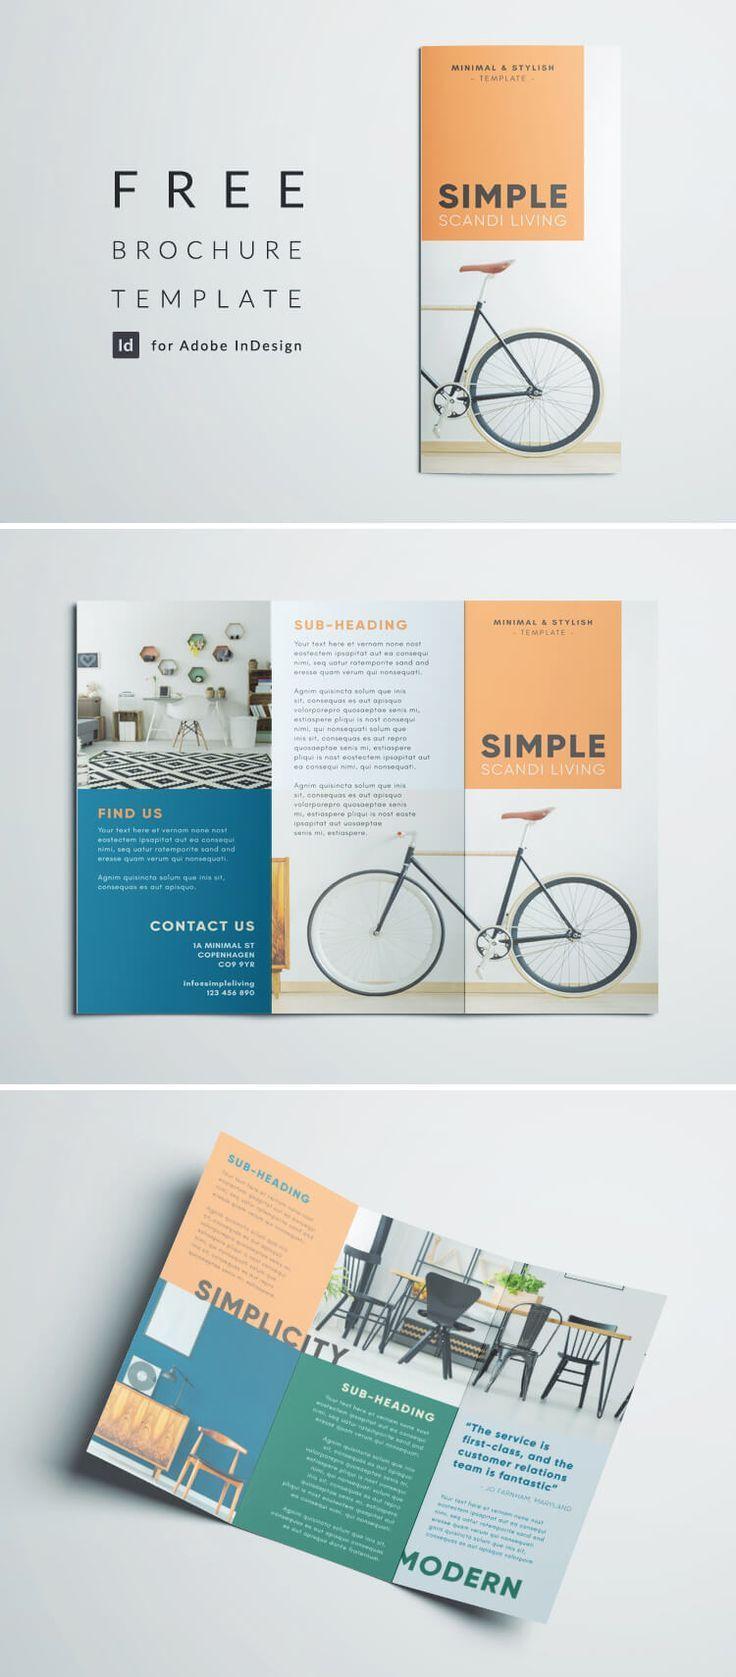 Simple Tri Fold Brochure Free Indesign Template Trifold Brochure Design Simple Brochures Indesign Brochure Templates Indesign 3 fold brochure template